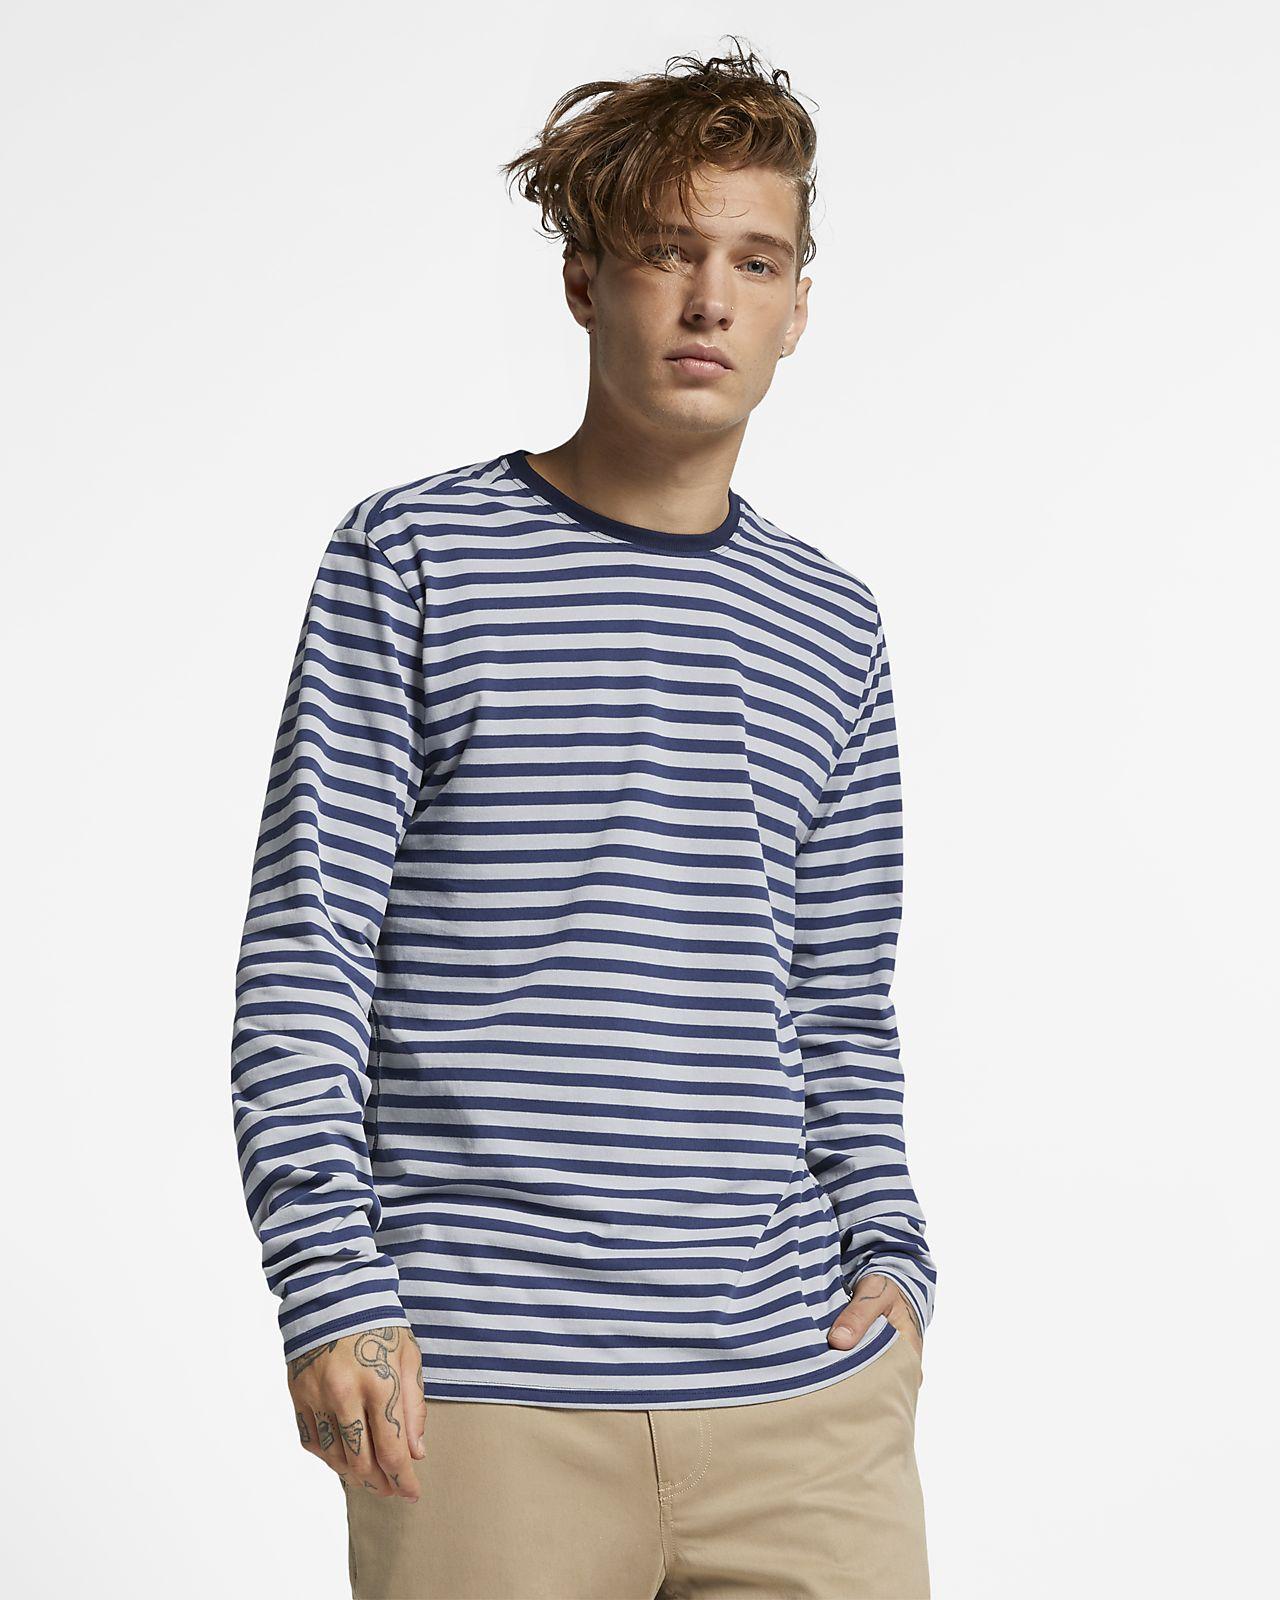 Hurley Dri-FIT Harvey Men's Long-Sleeve Striped Top